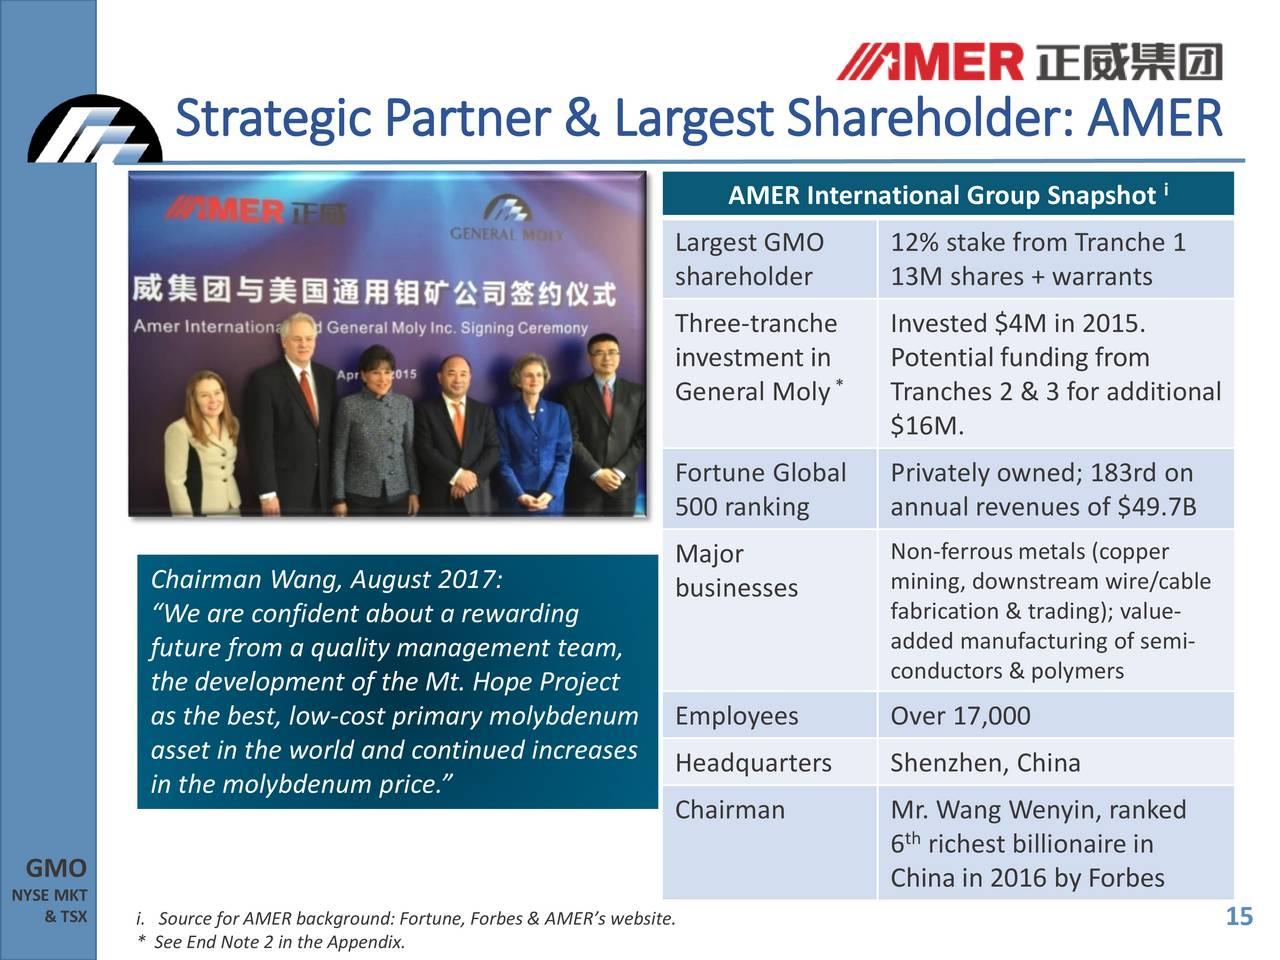 SAFER Web - Company Snapshot 4M TRADING INC